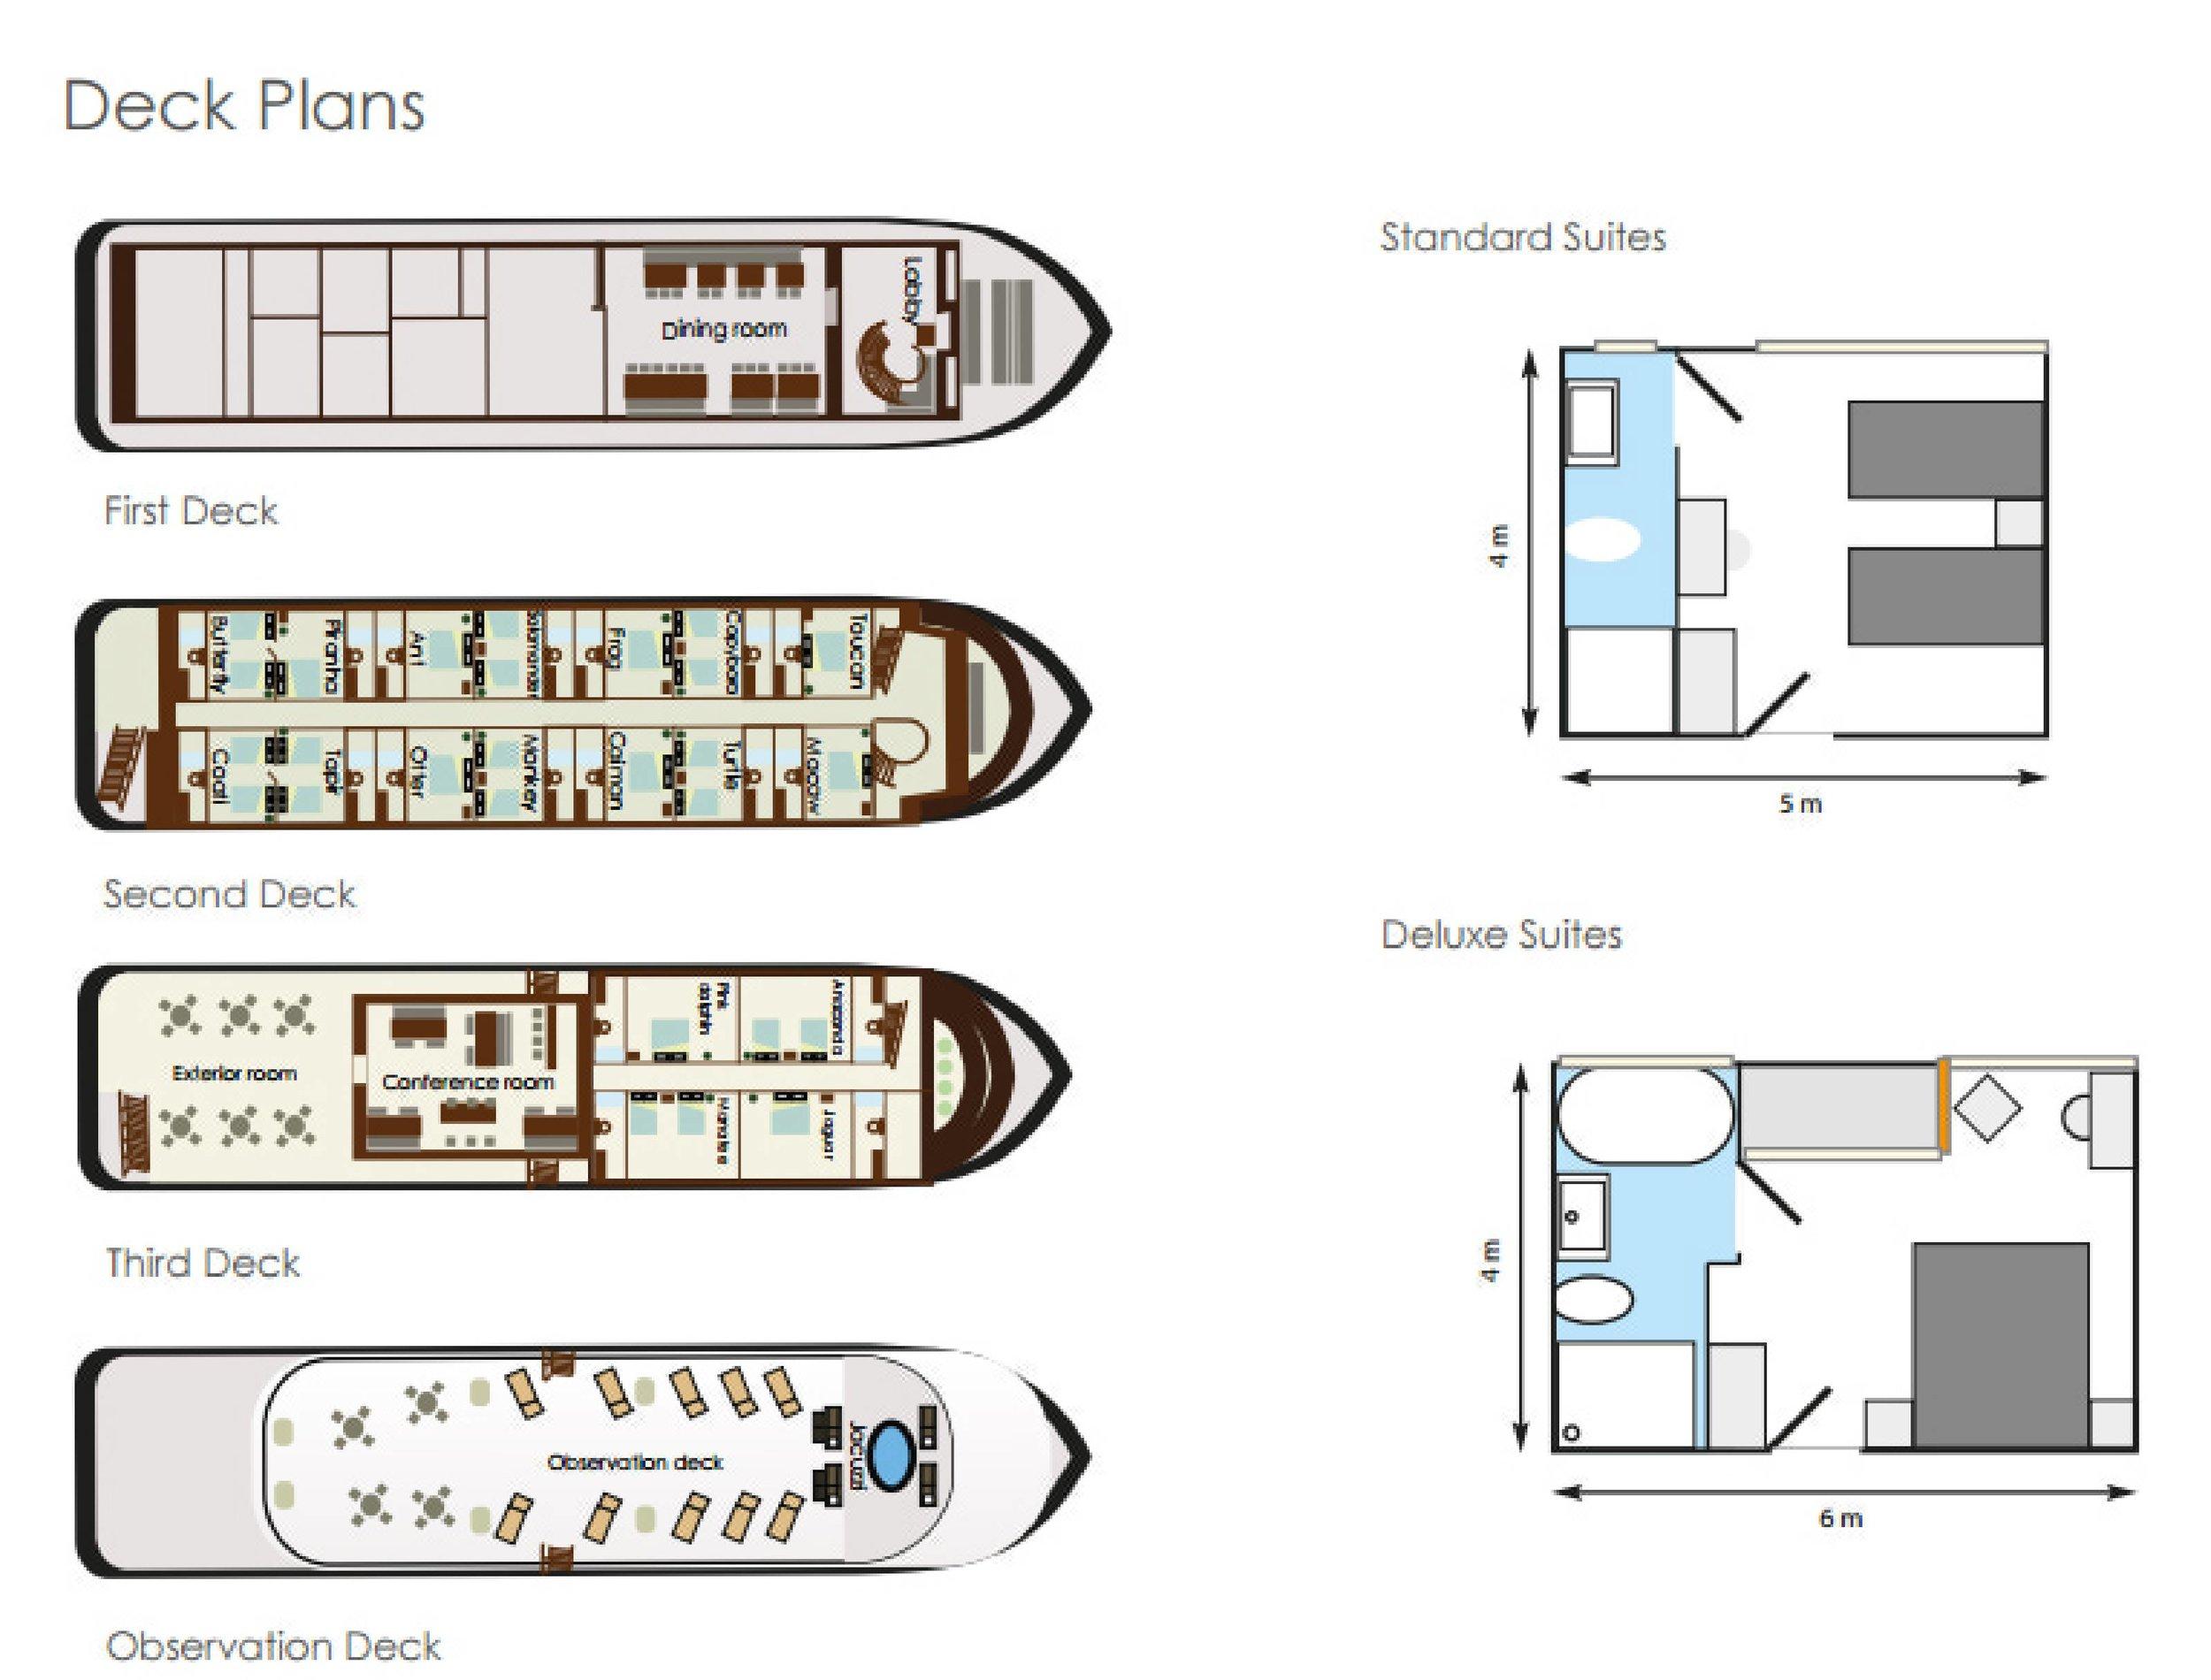 Anakonda Amazon Cruise - Deck Plan